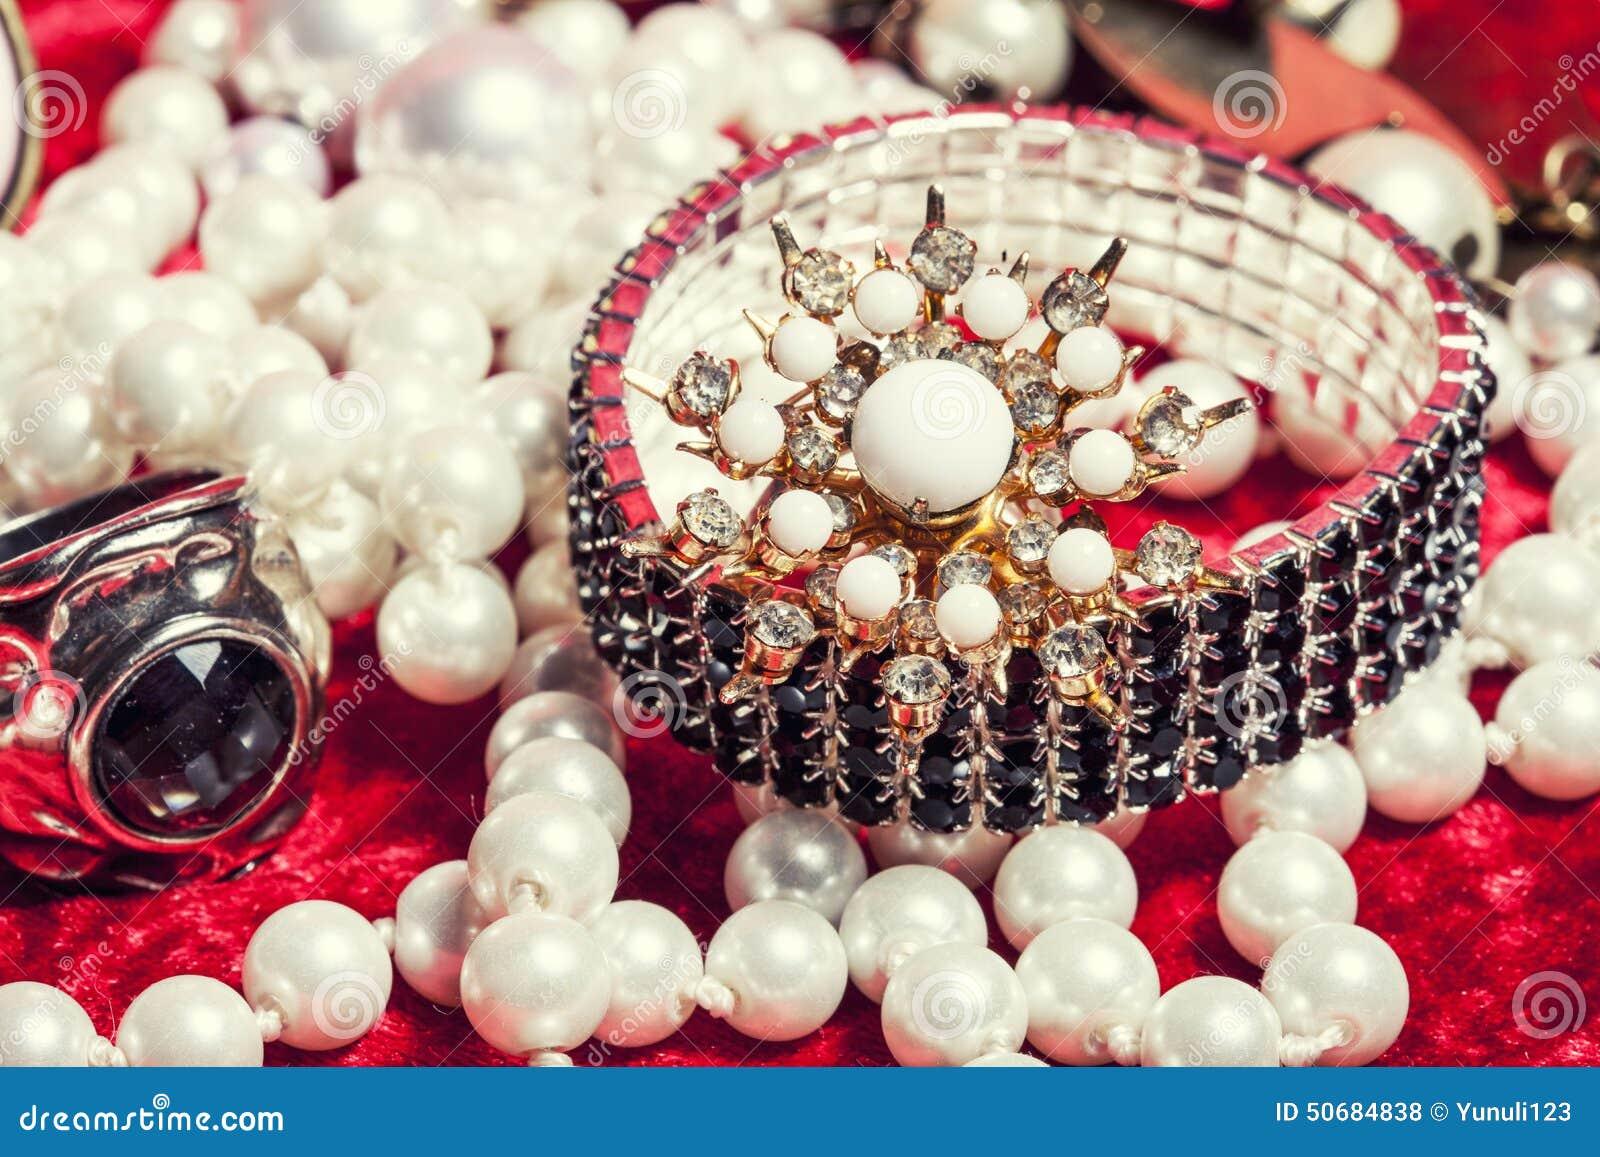 Download 全部首饰关闭在红色天鹅绒箱子,圆环 库存照片. 图片 包括有 宝石, 对象, 成串珠状, 链子, 豪华, beautifuler - 50684838